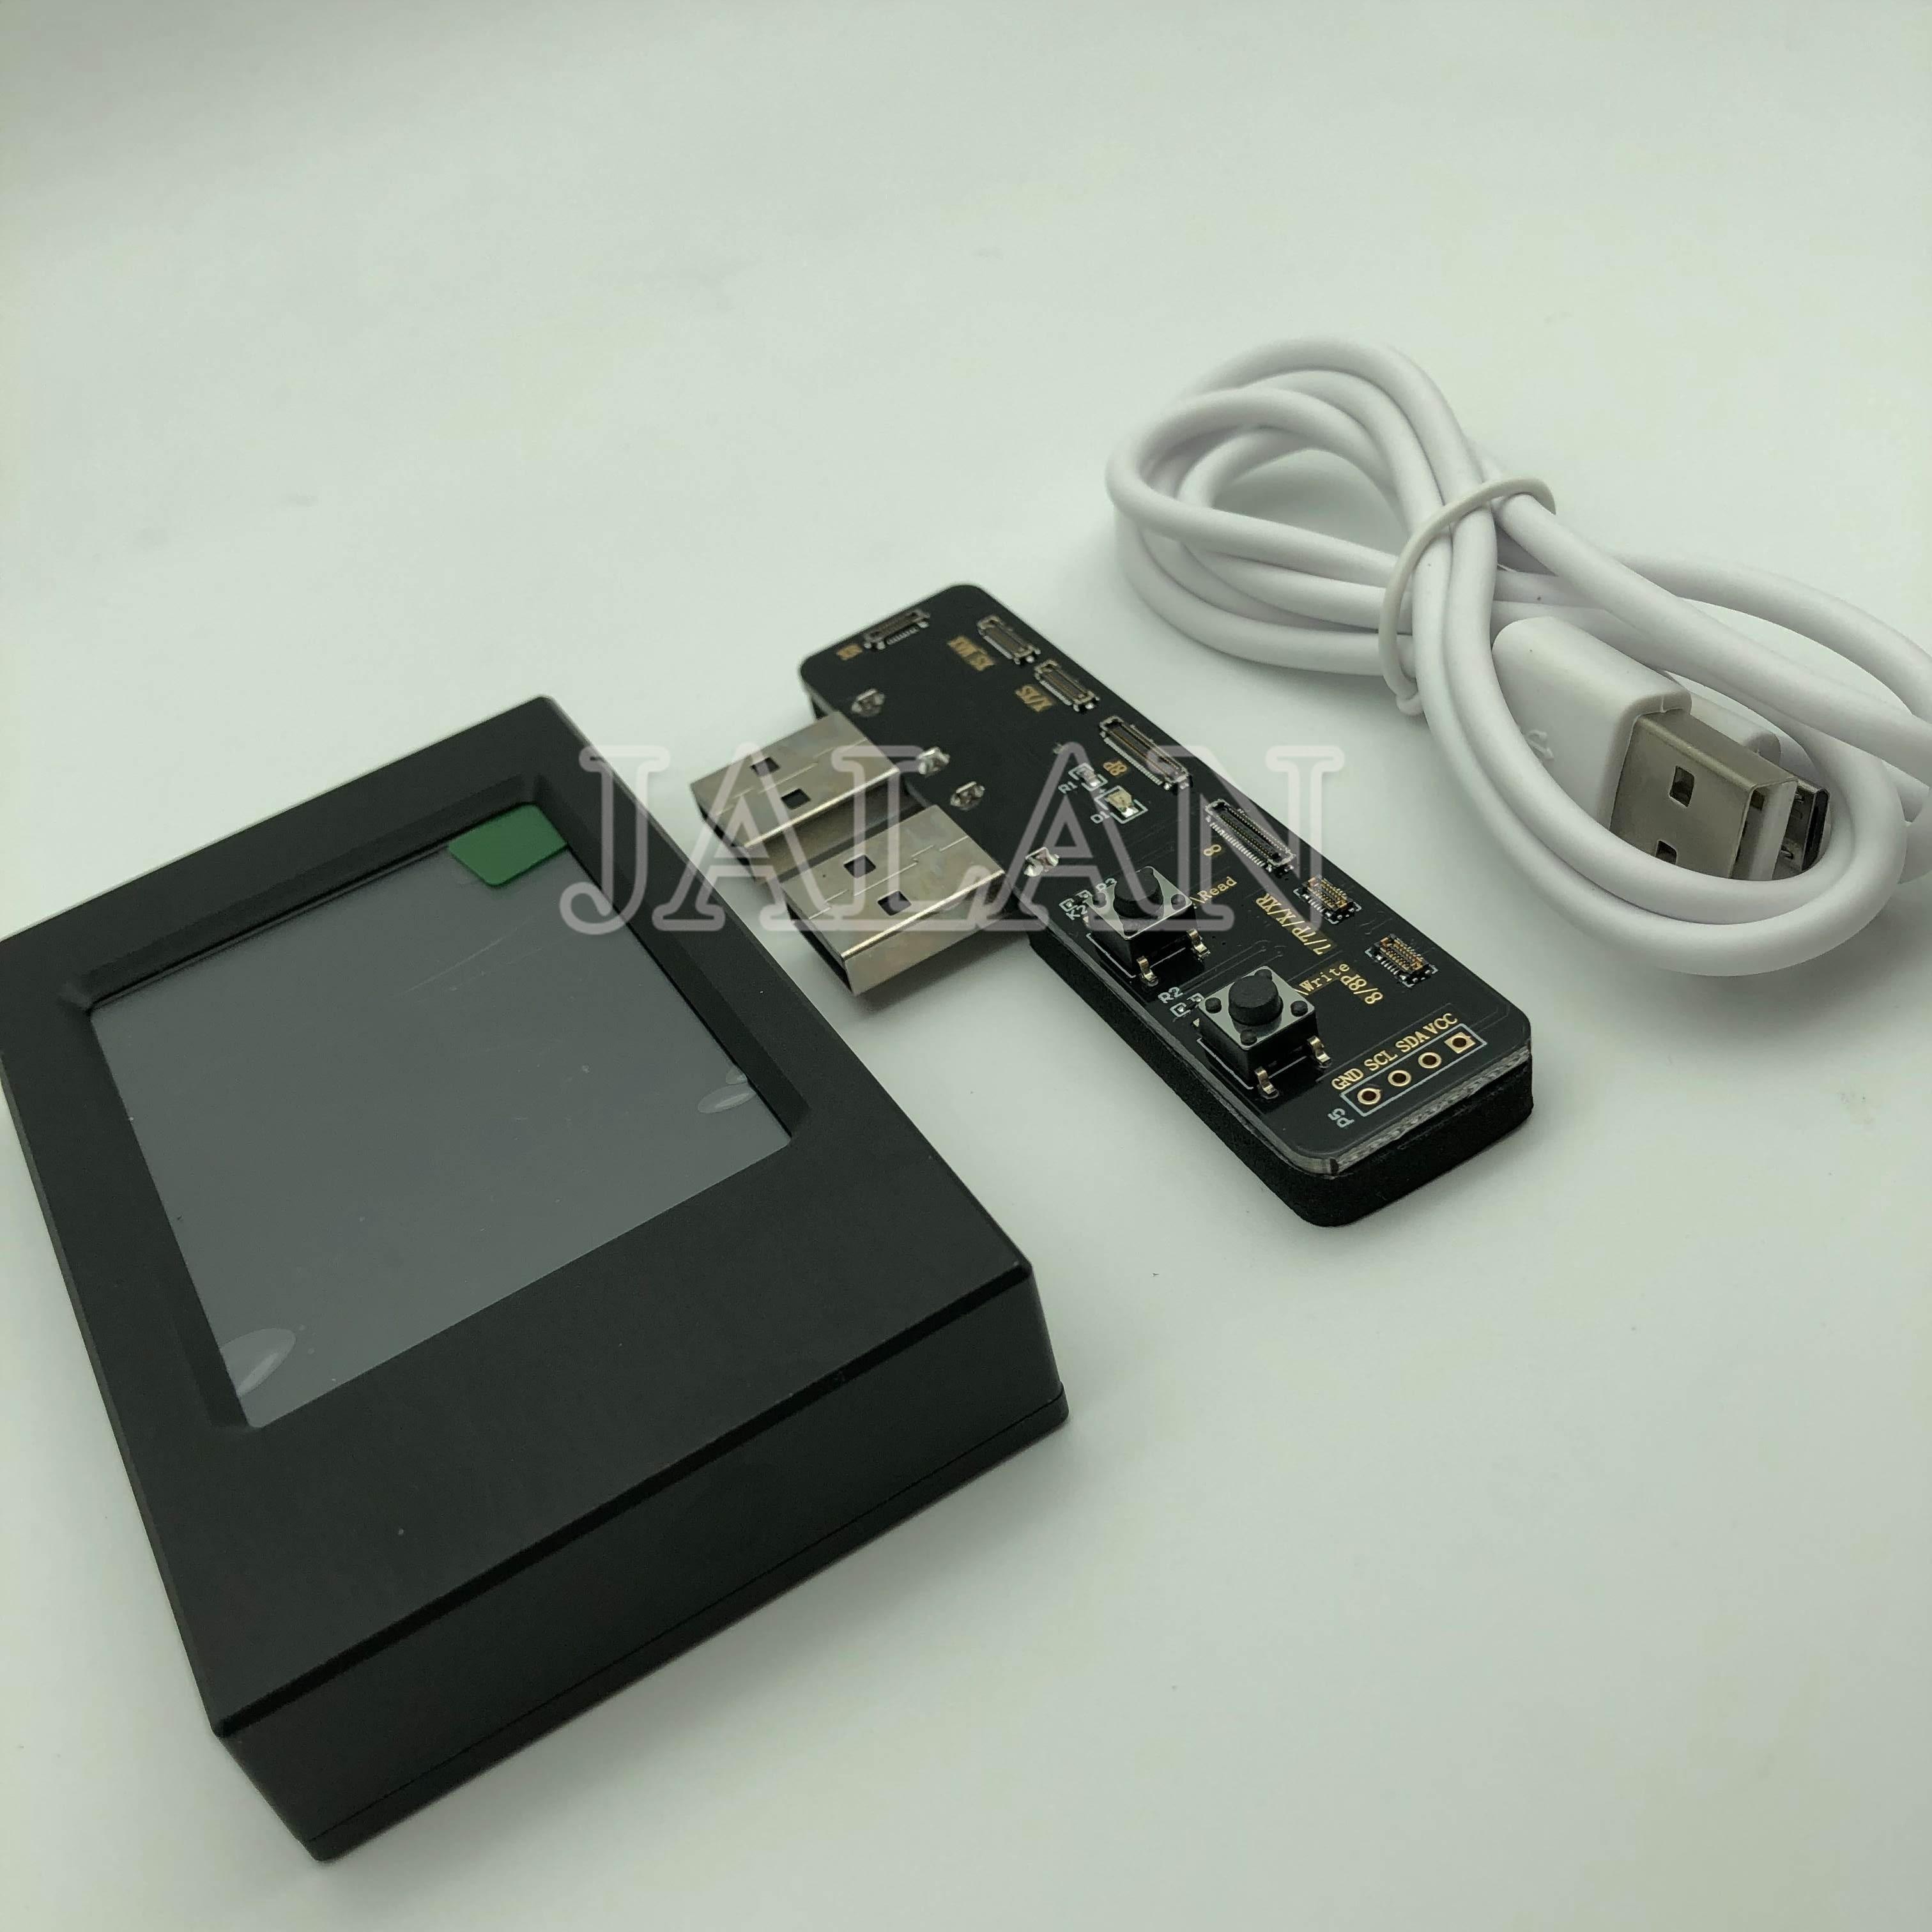 light recovery sensor programmer box Professional repair tools For iPhone 7/7P/8/8P/X/XS/MAX/XR copy/oem screen true tone repair-in Phone Repair Tool Sets from Cellphones & Telecommunications